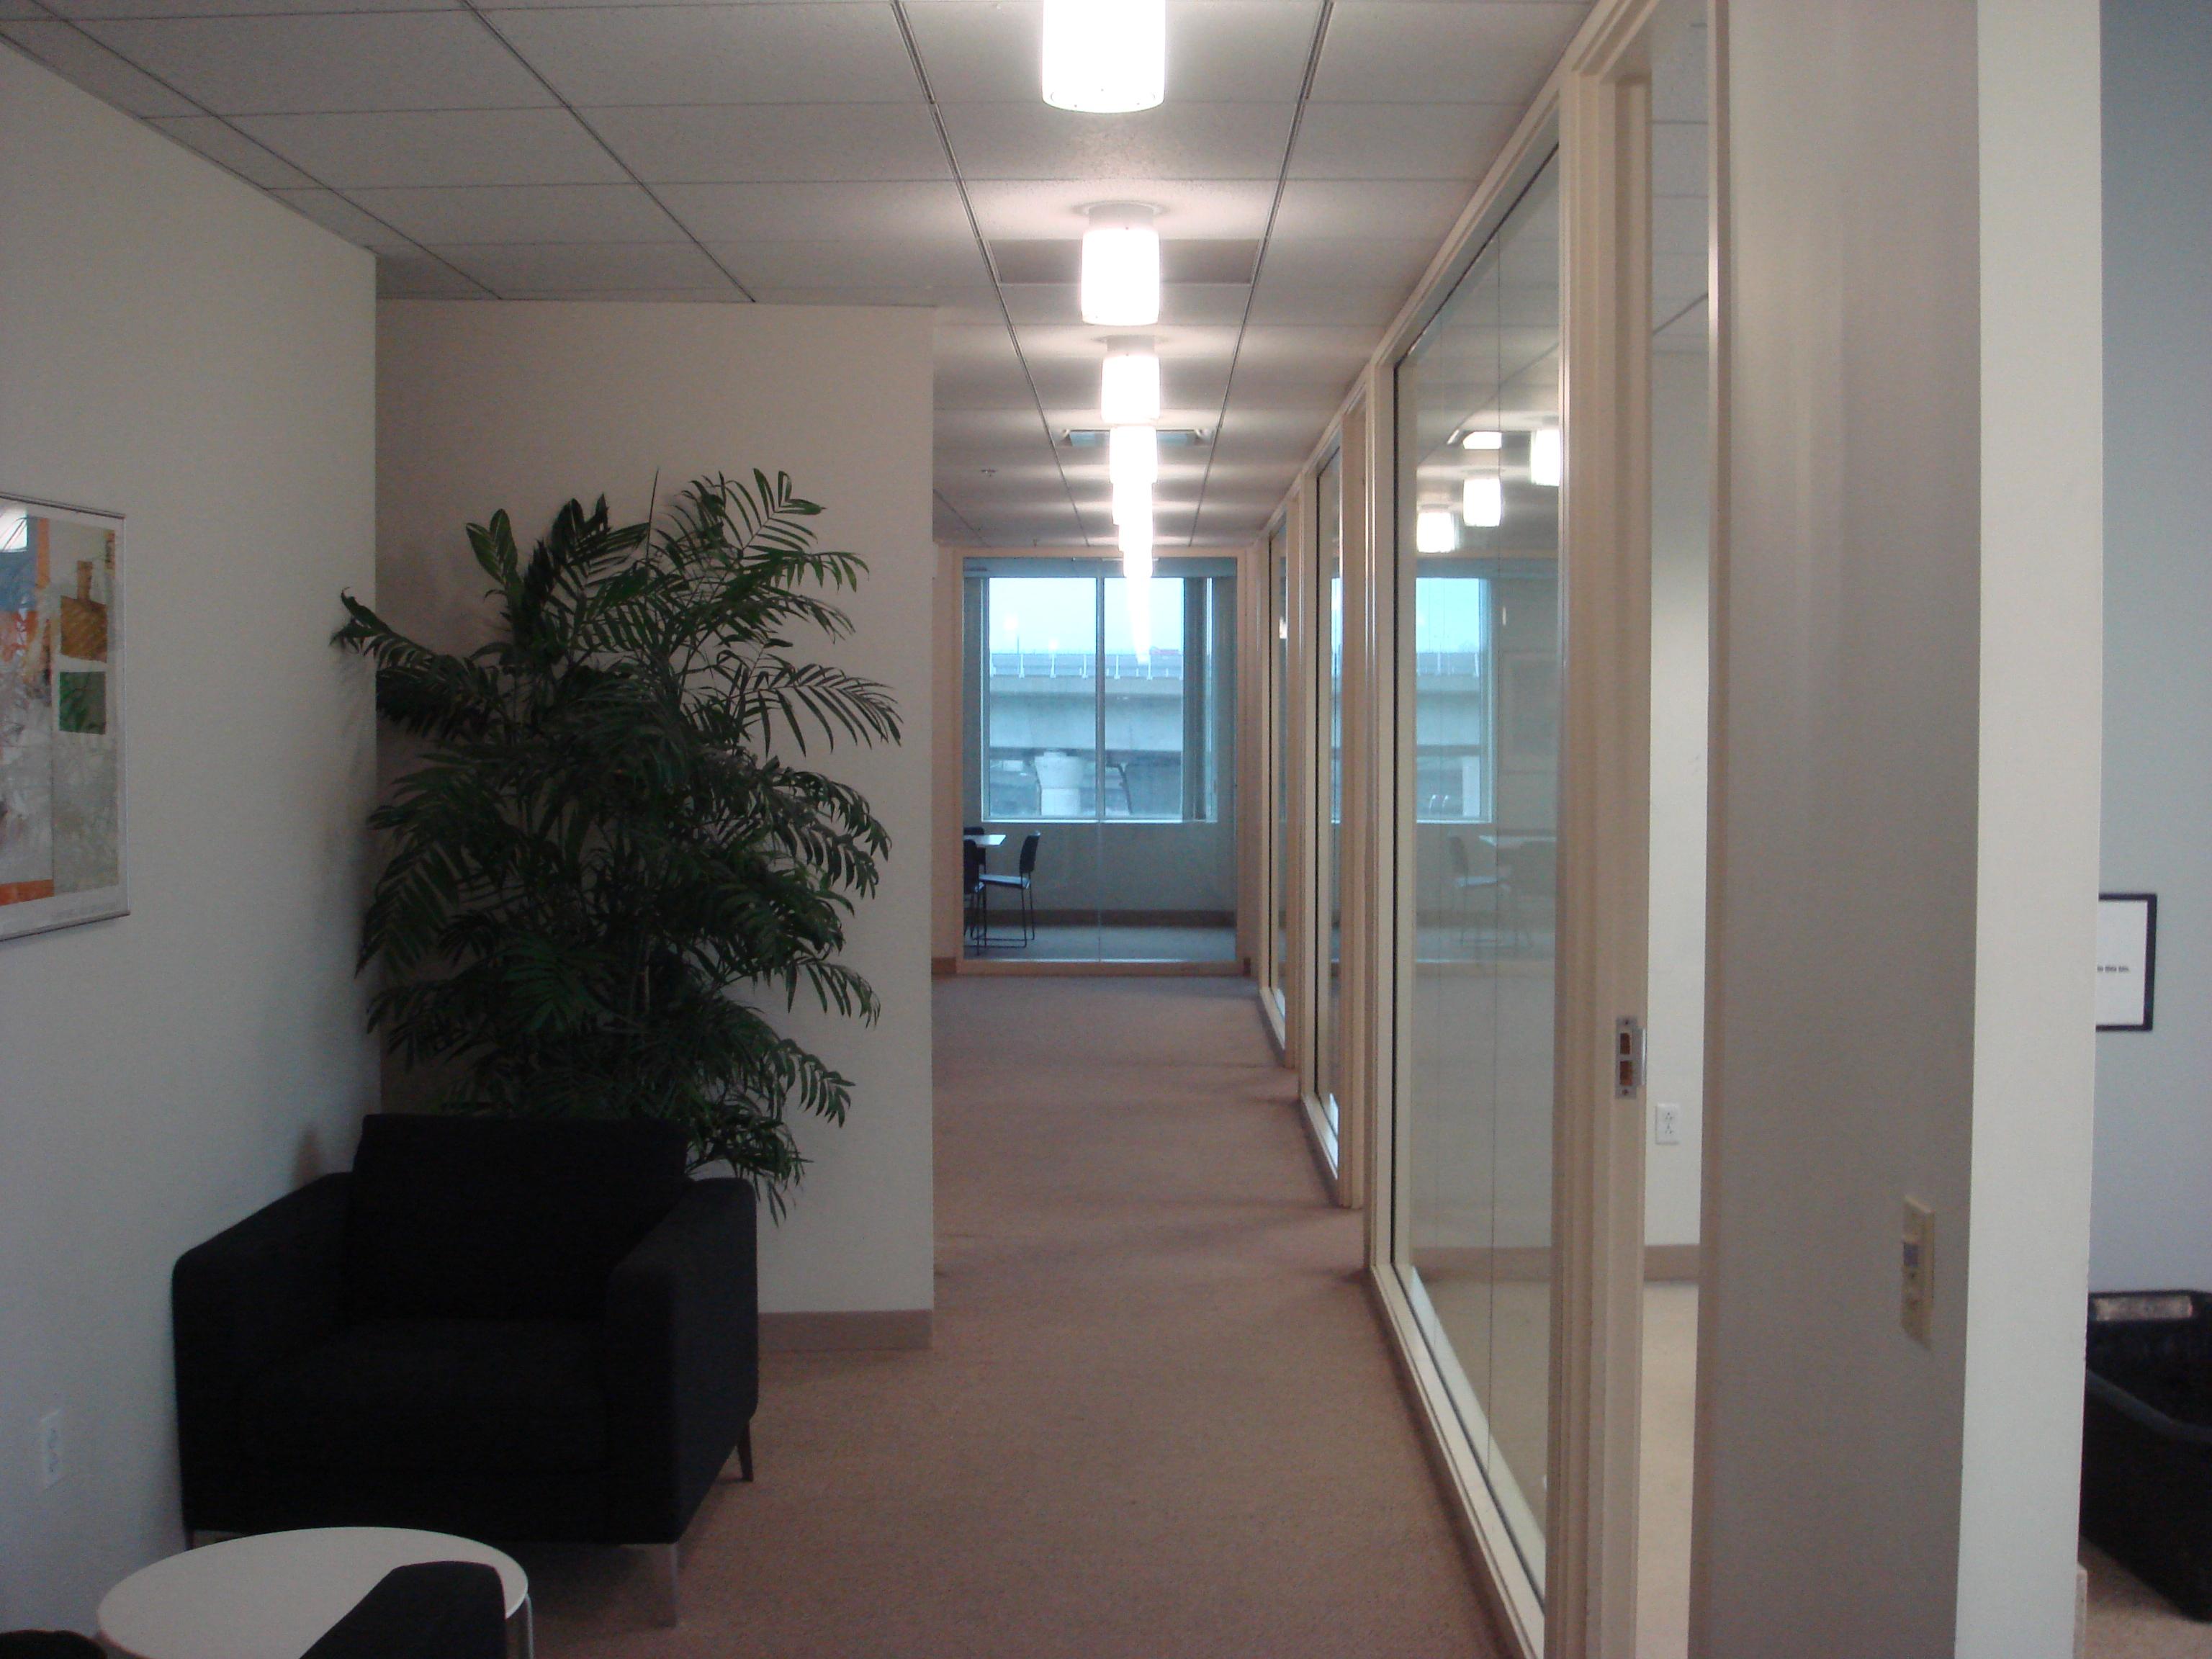 Hultボストンの会議室前廊下